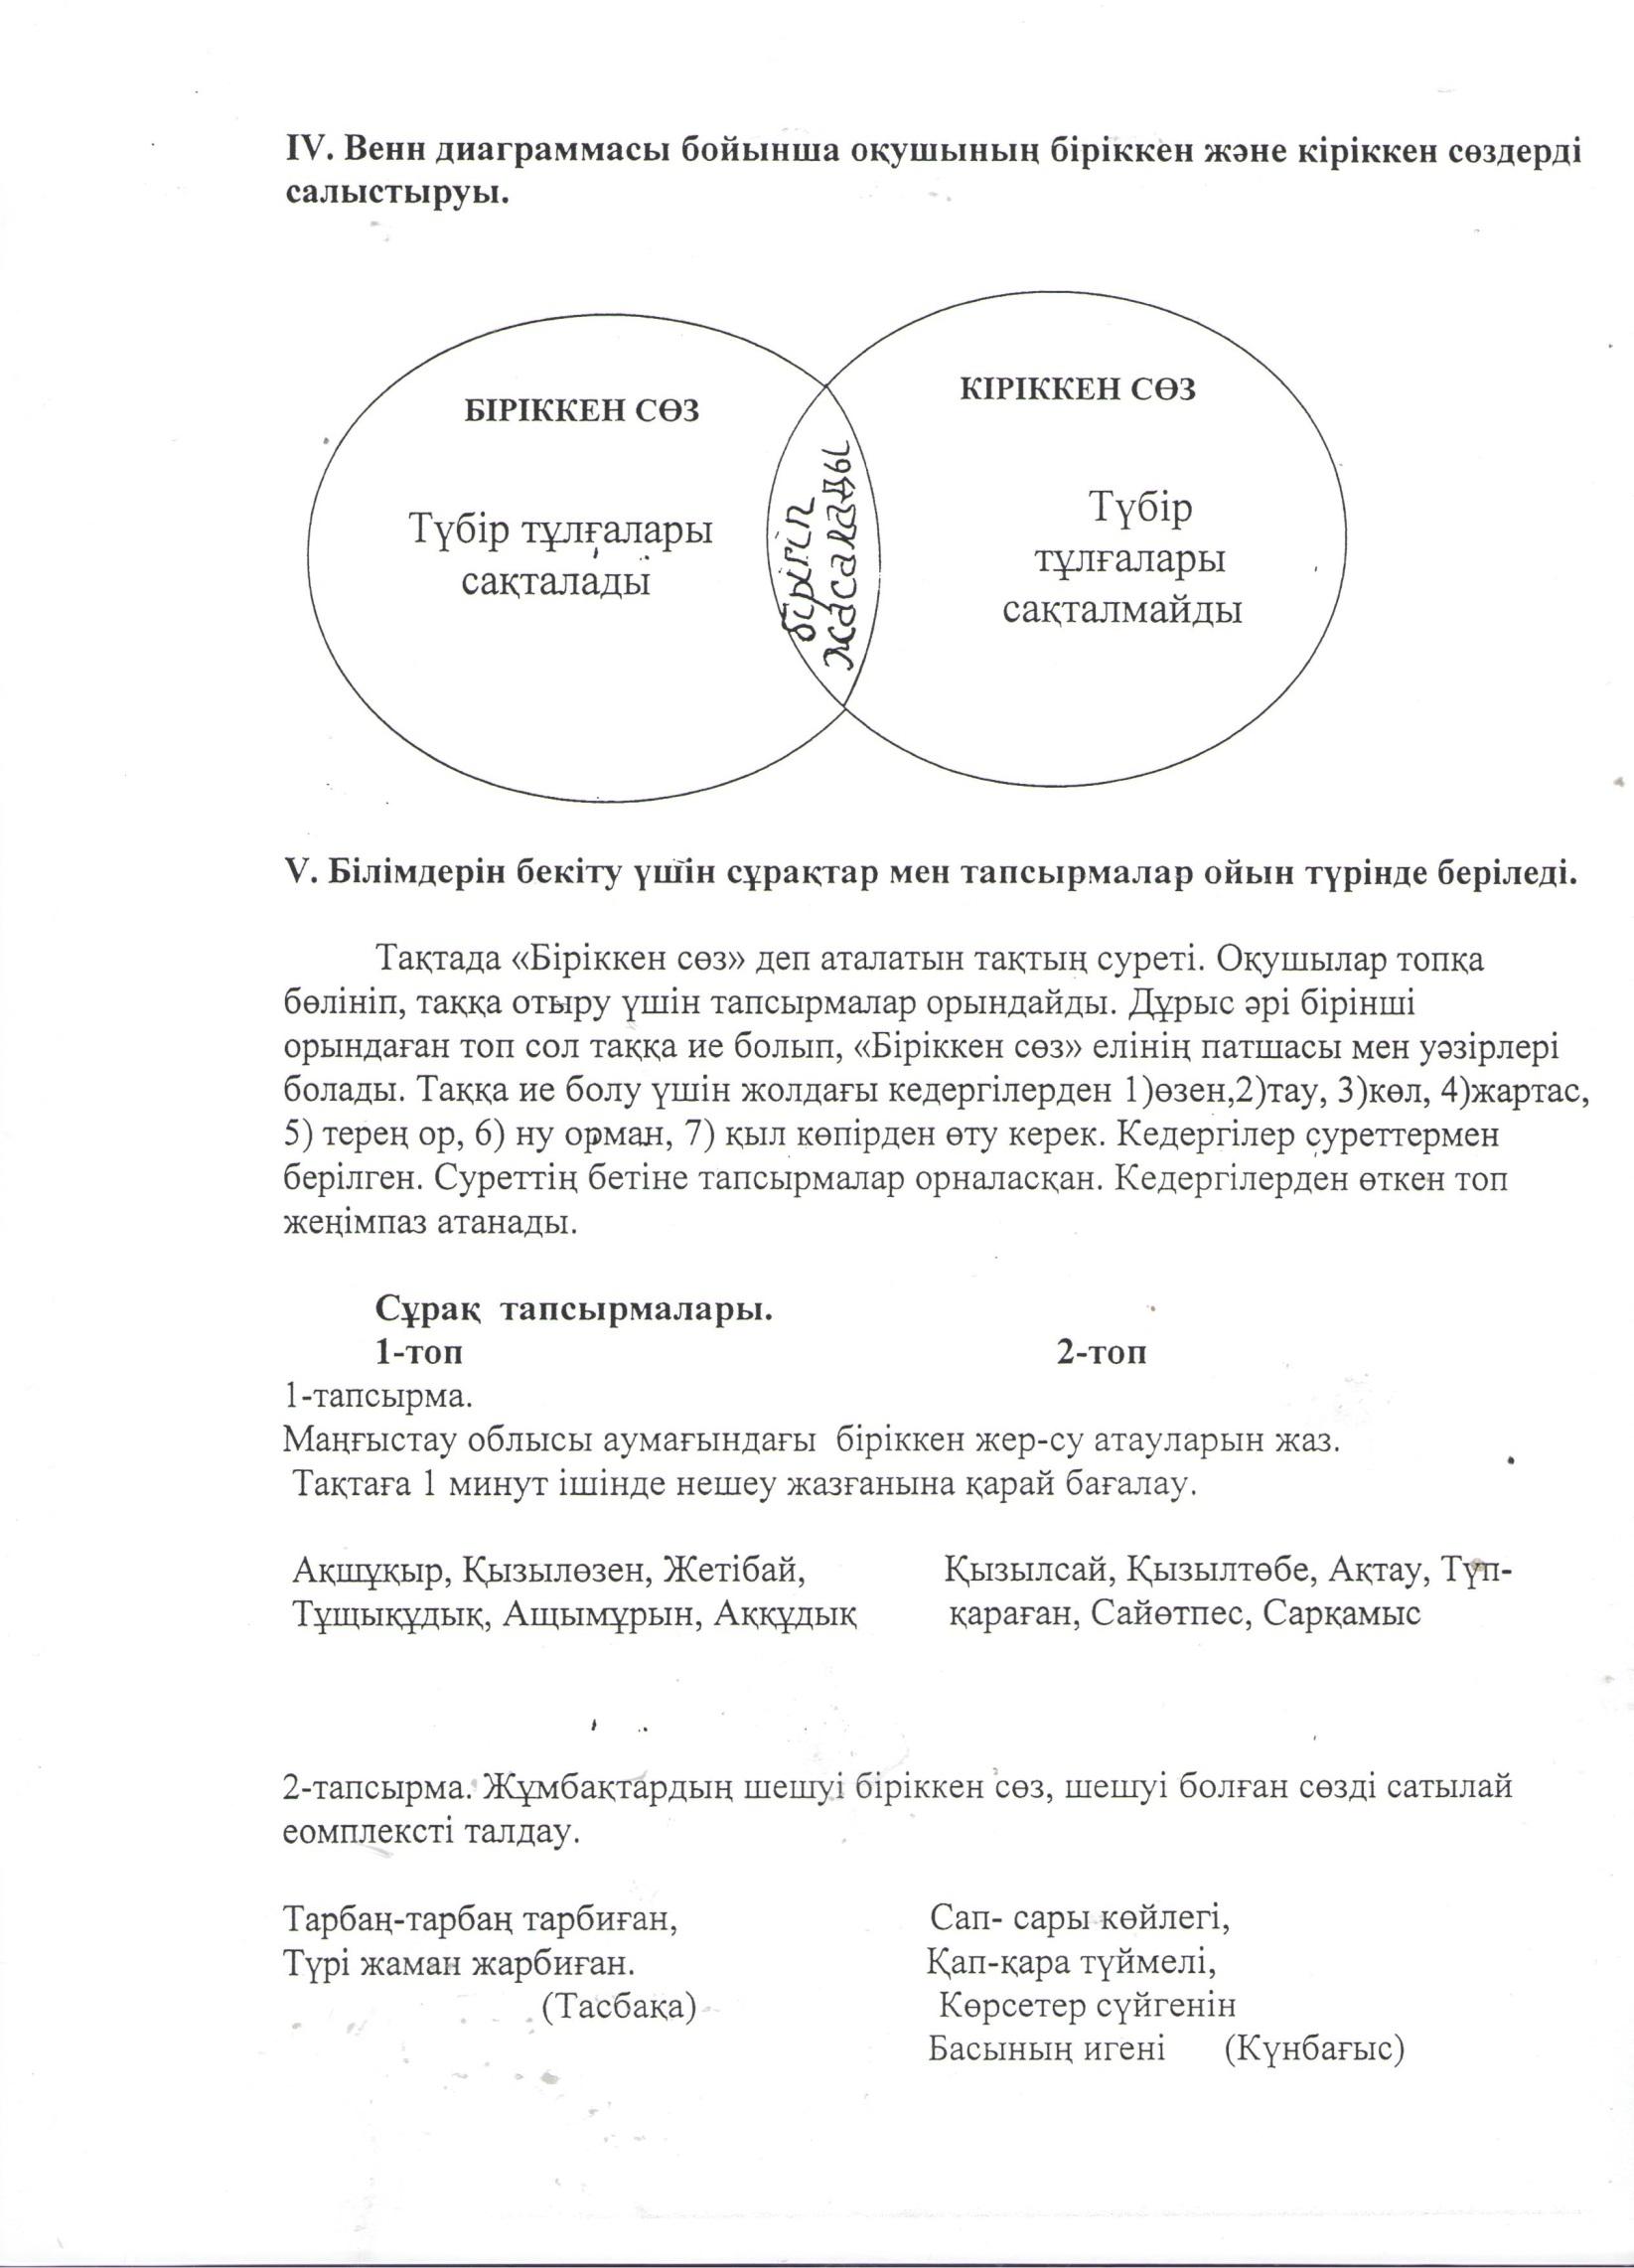 C:\Users\Ербол\Documents\Scanned Documents\Рисунок (3).jpg